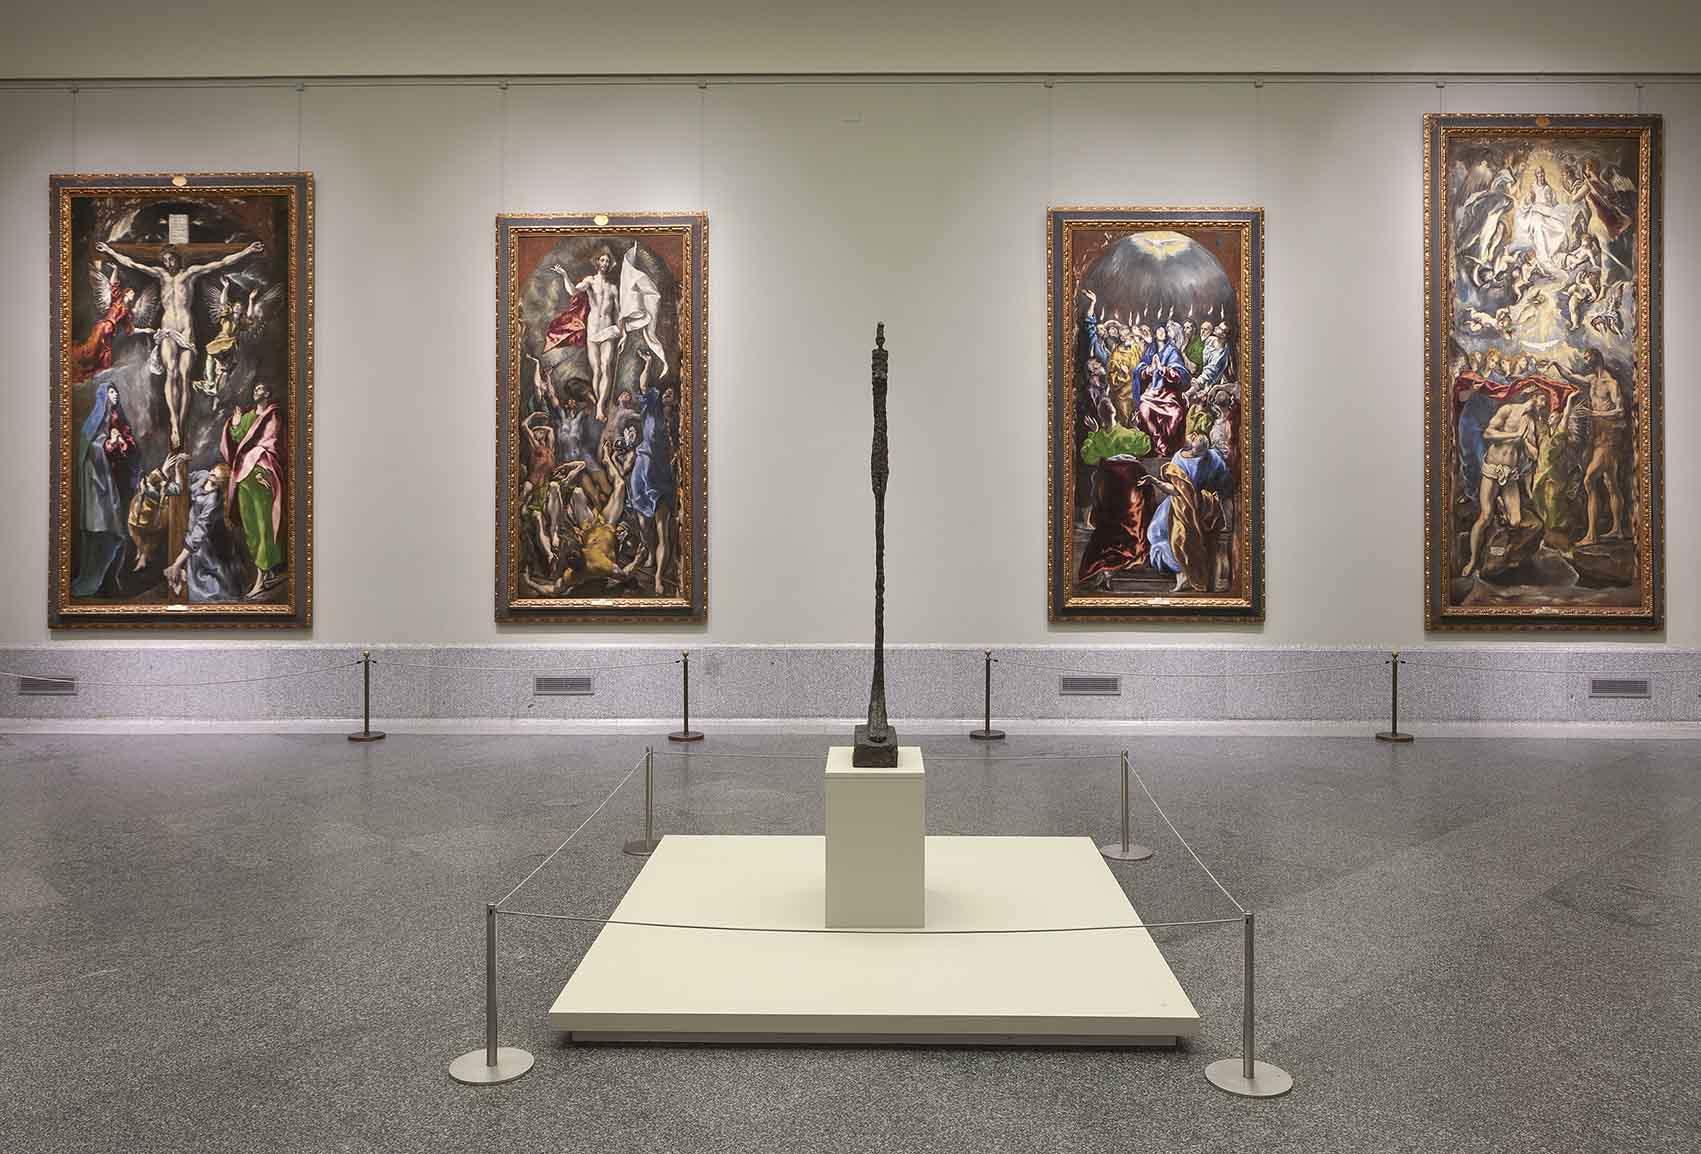 Giacometti dialoga con los grandes maestros del Prado Artes & contextos c0118d84 fd5f 8d55 0b95 7c295f90ea5f